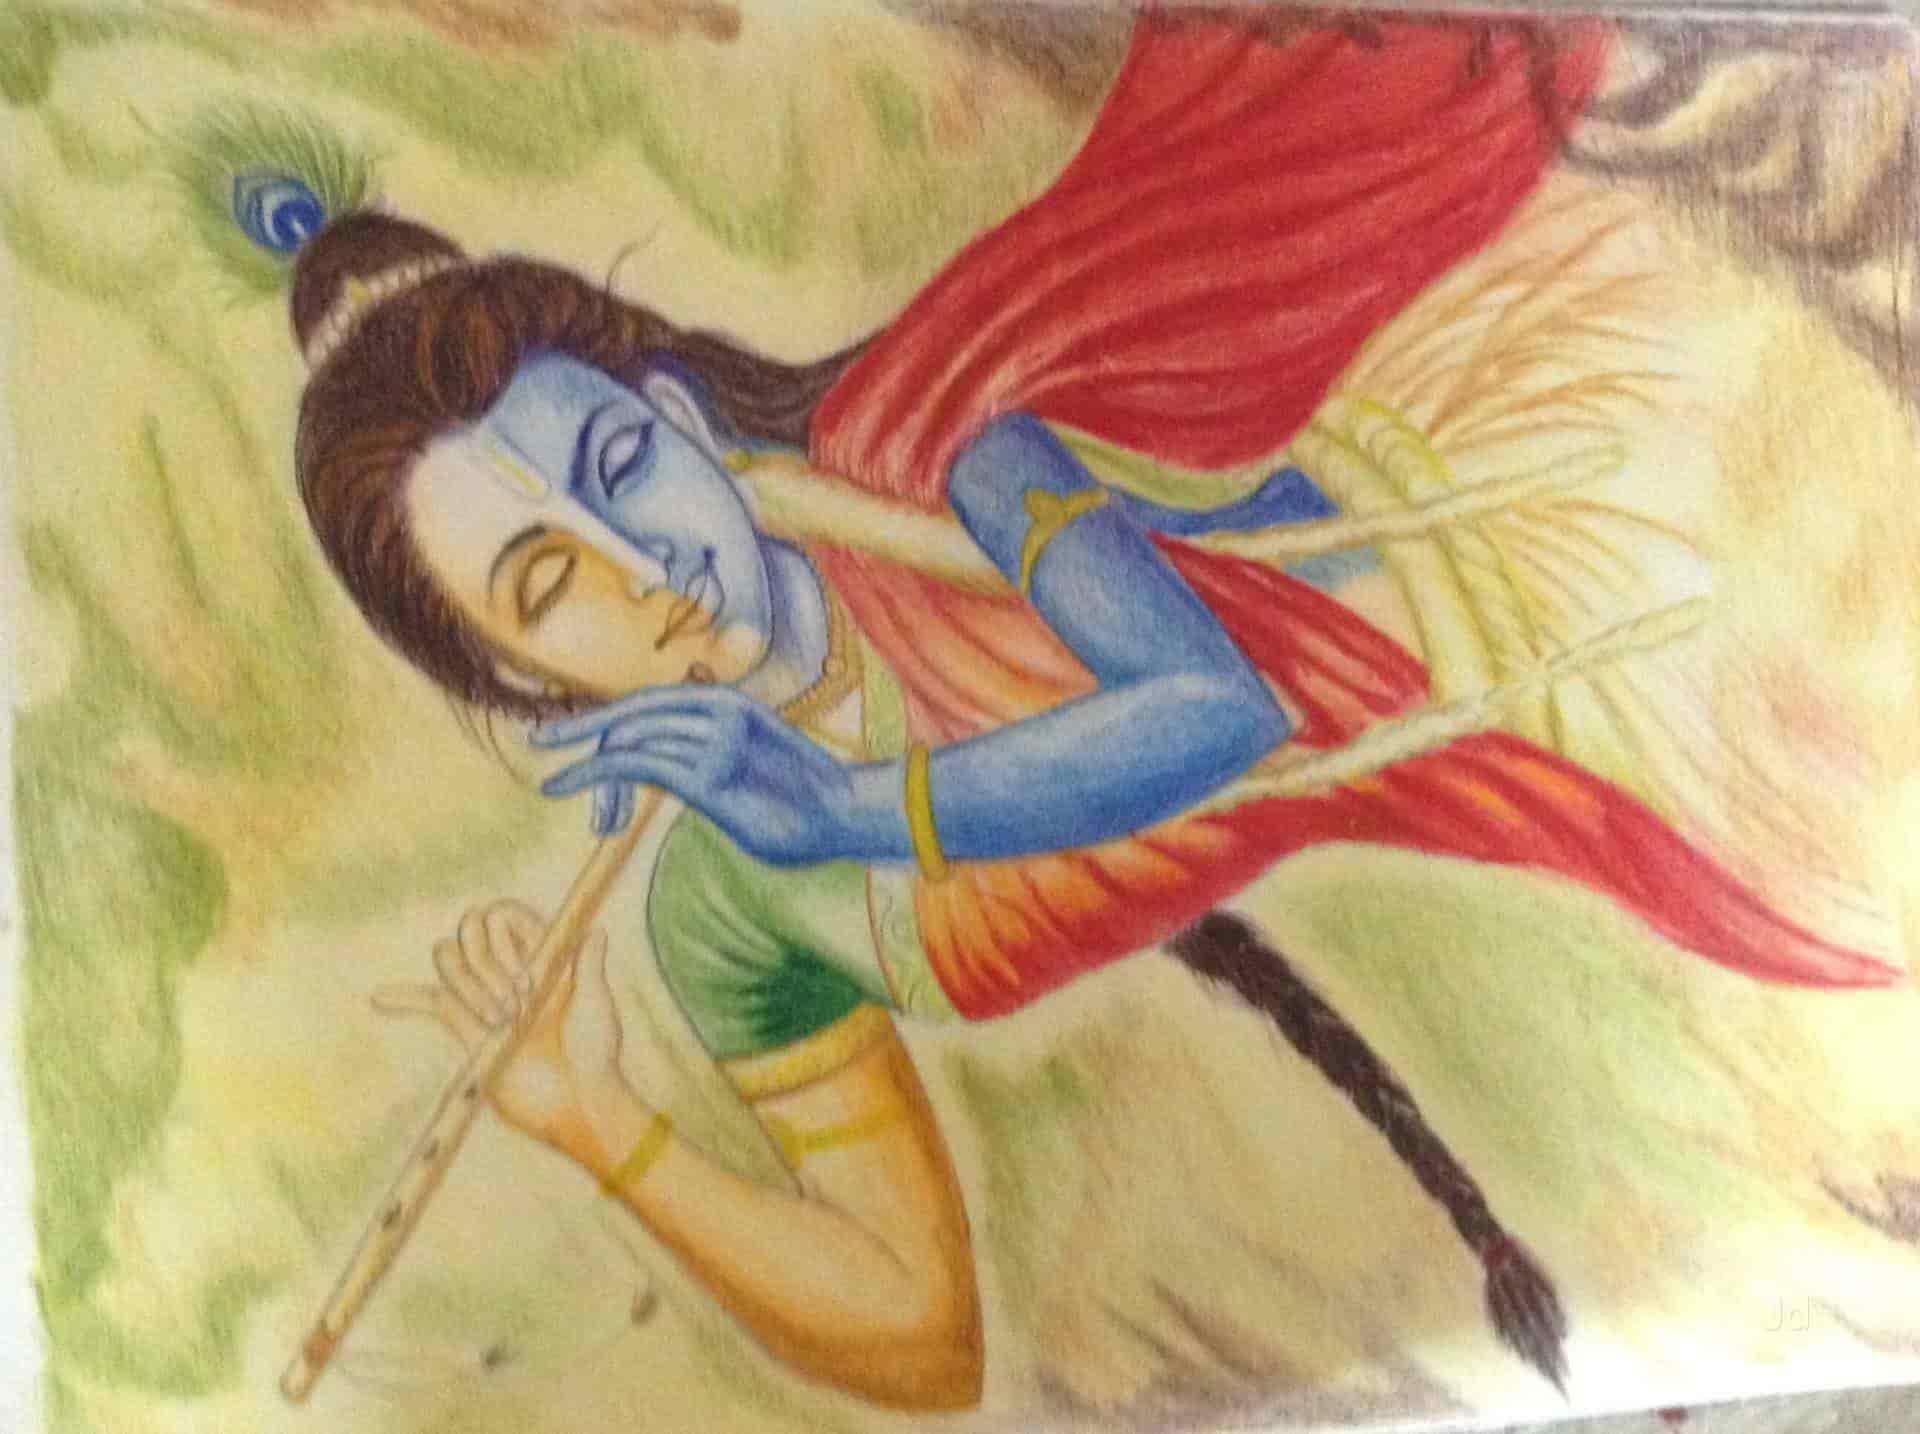 Top 20 Sketching Classes In Nagpur Best Art Classes Justdial